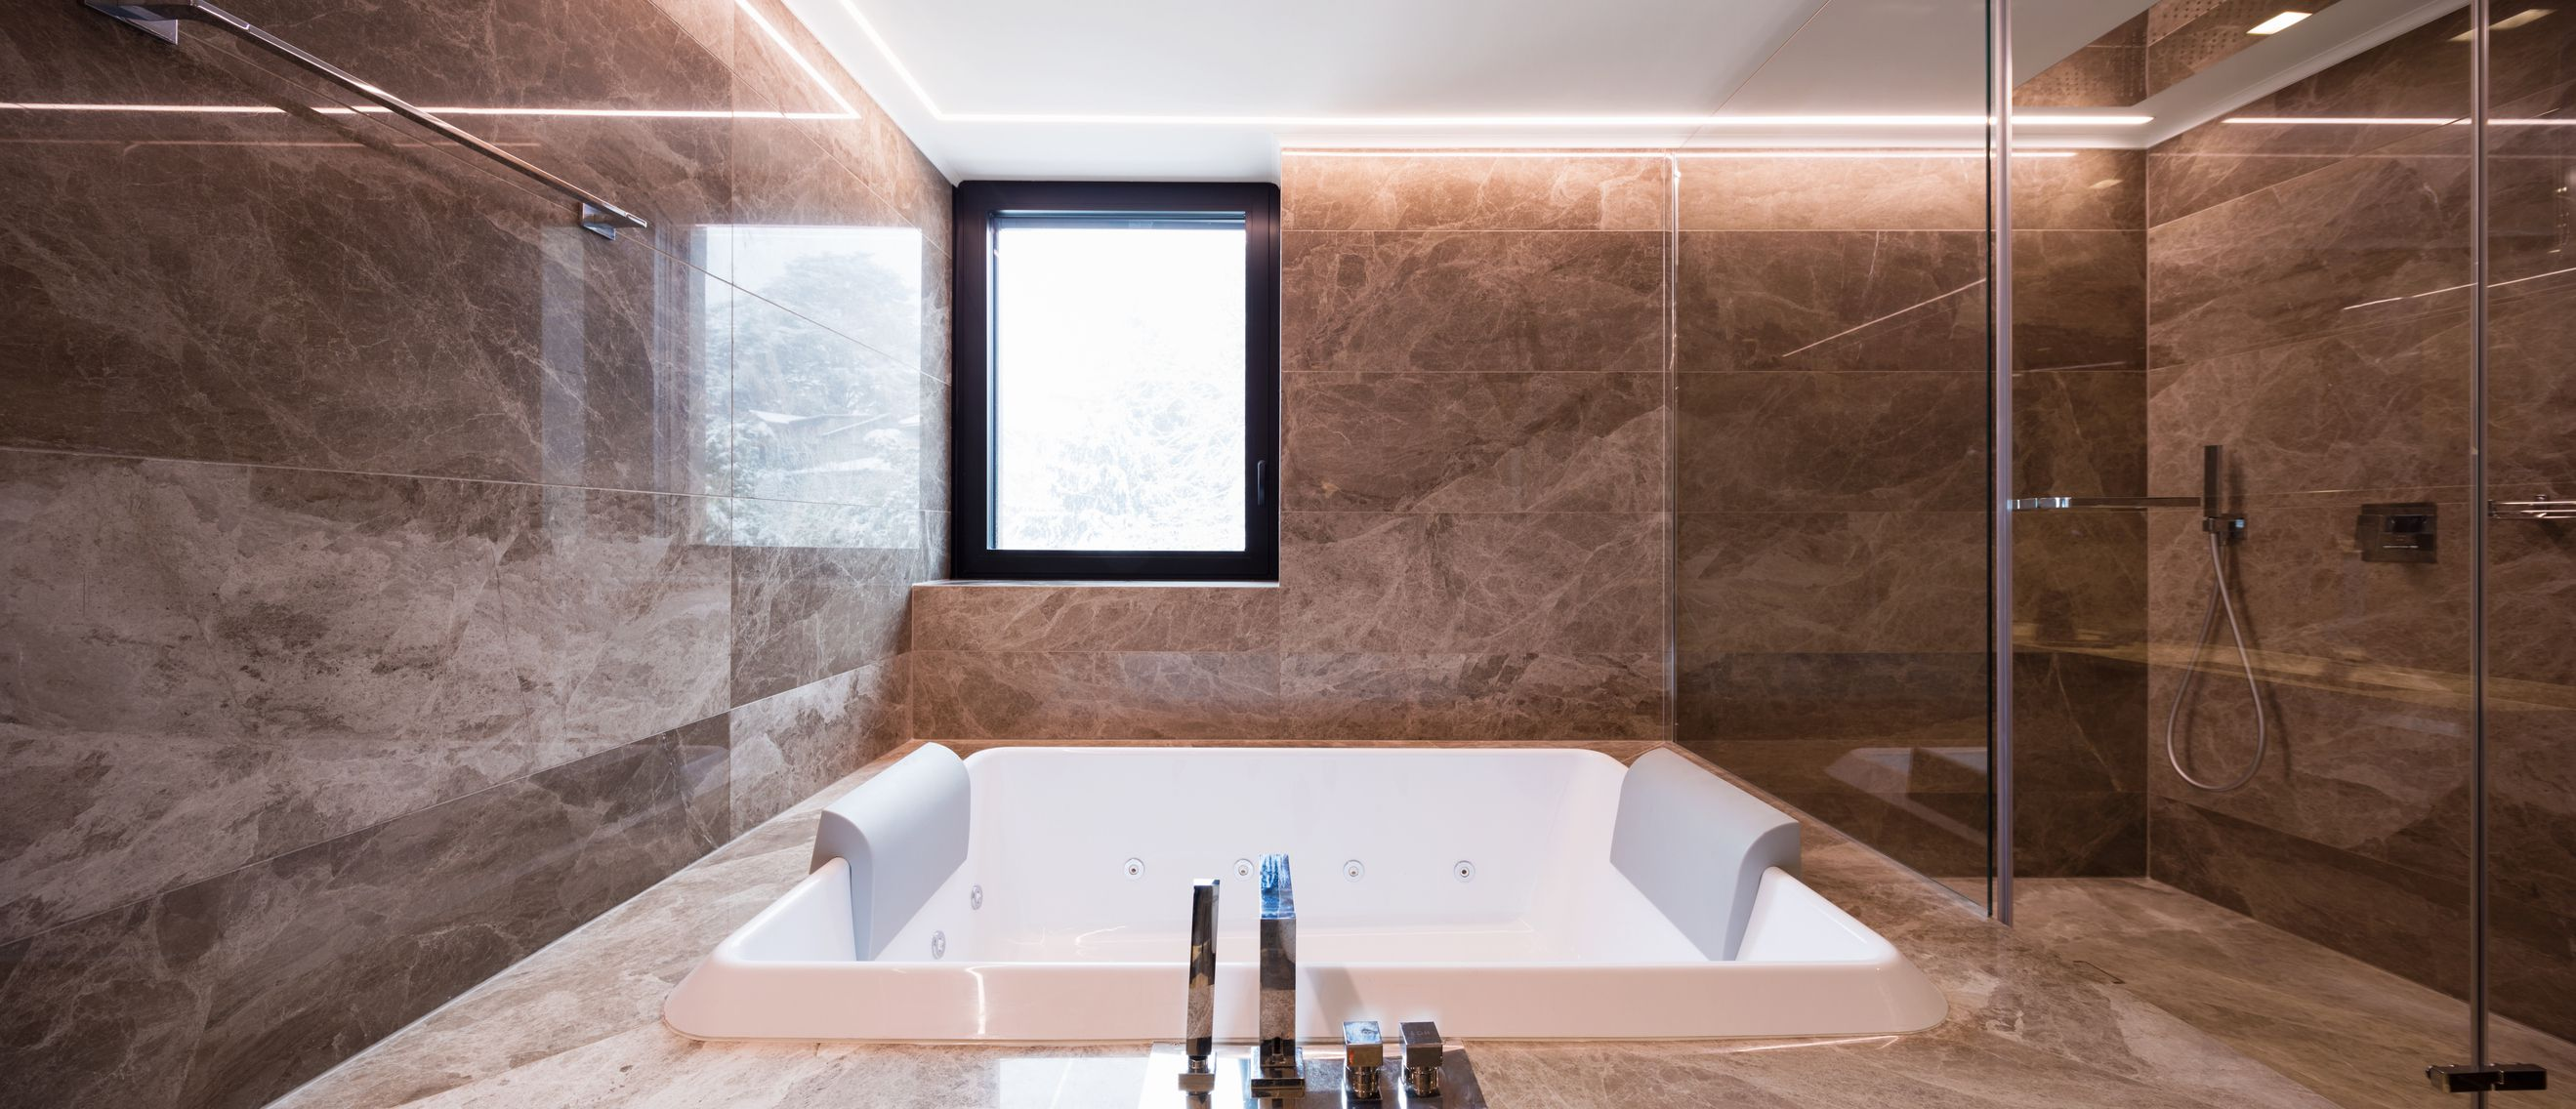 Hydromassage Bathtub Electrical Codes